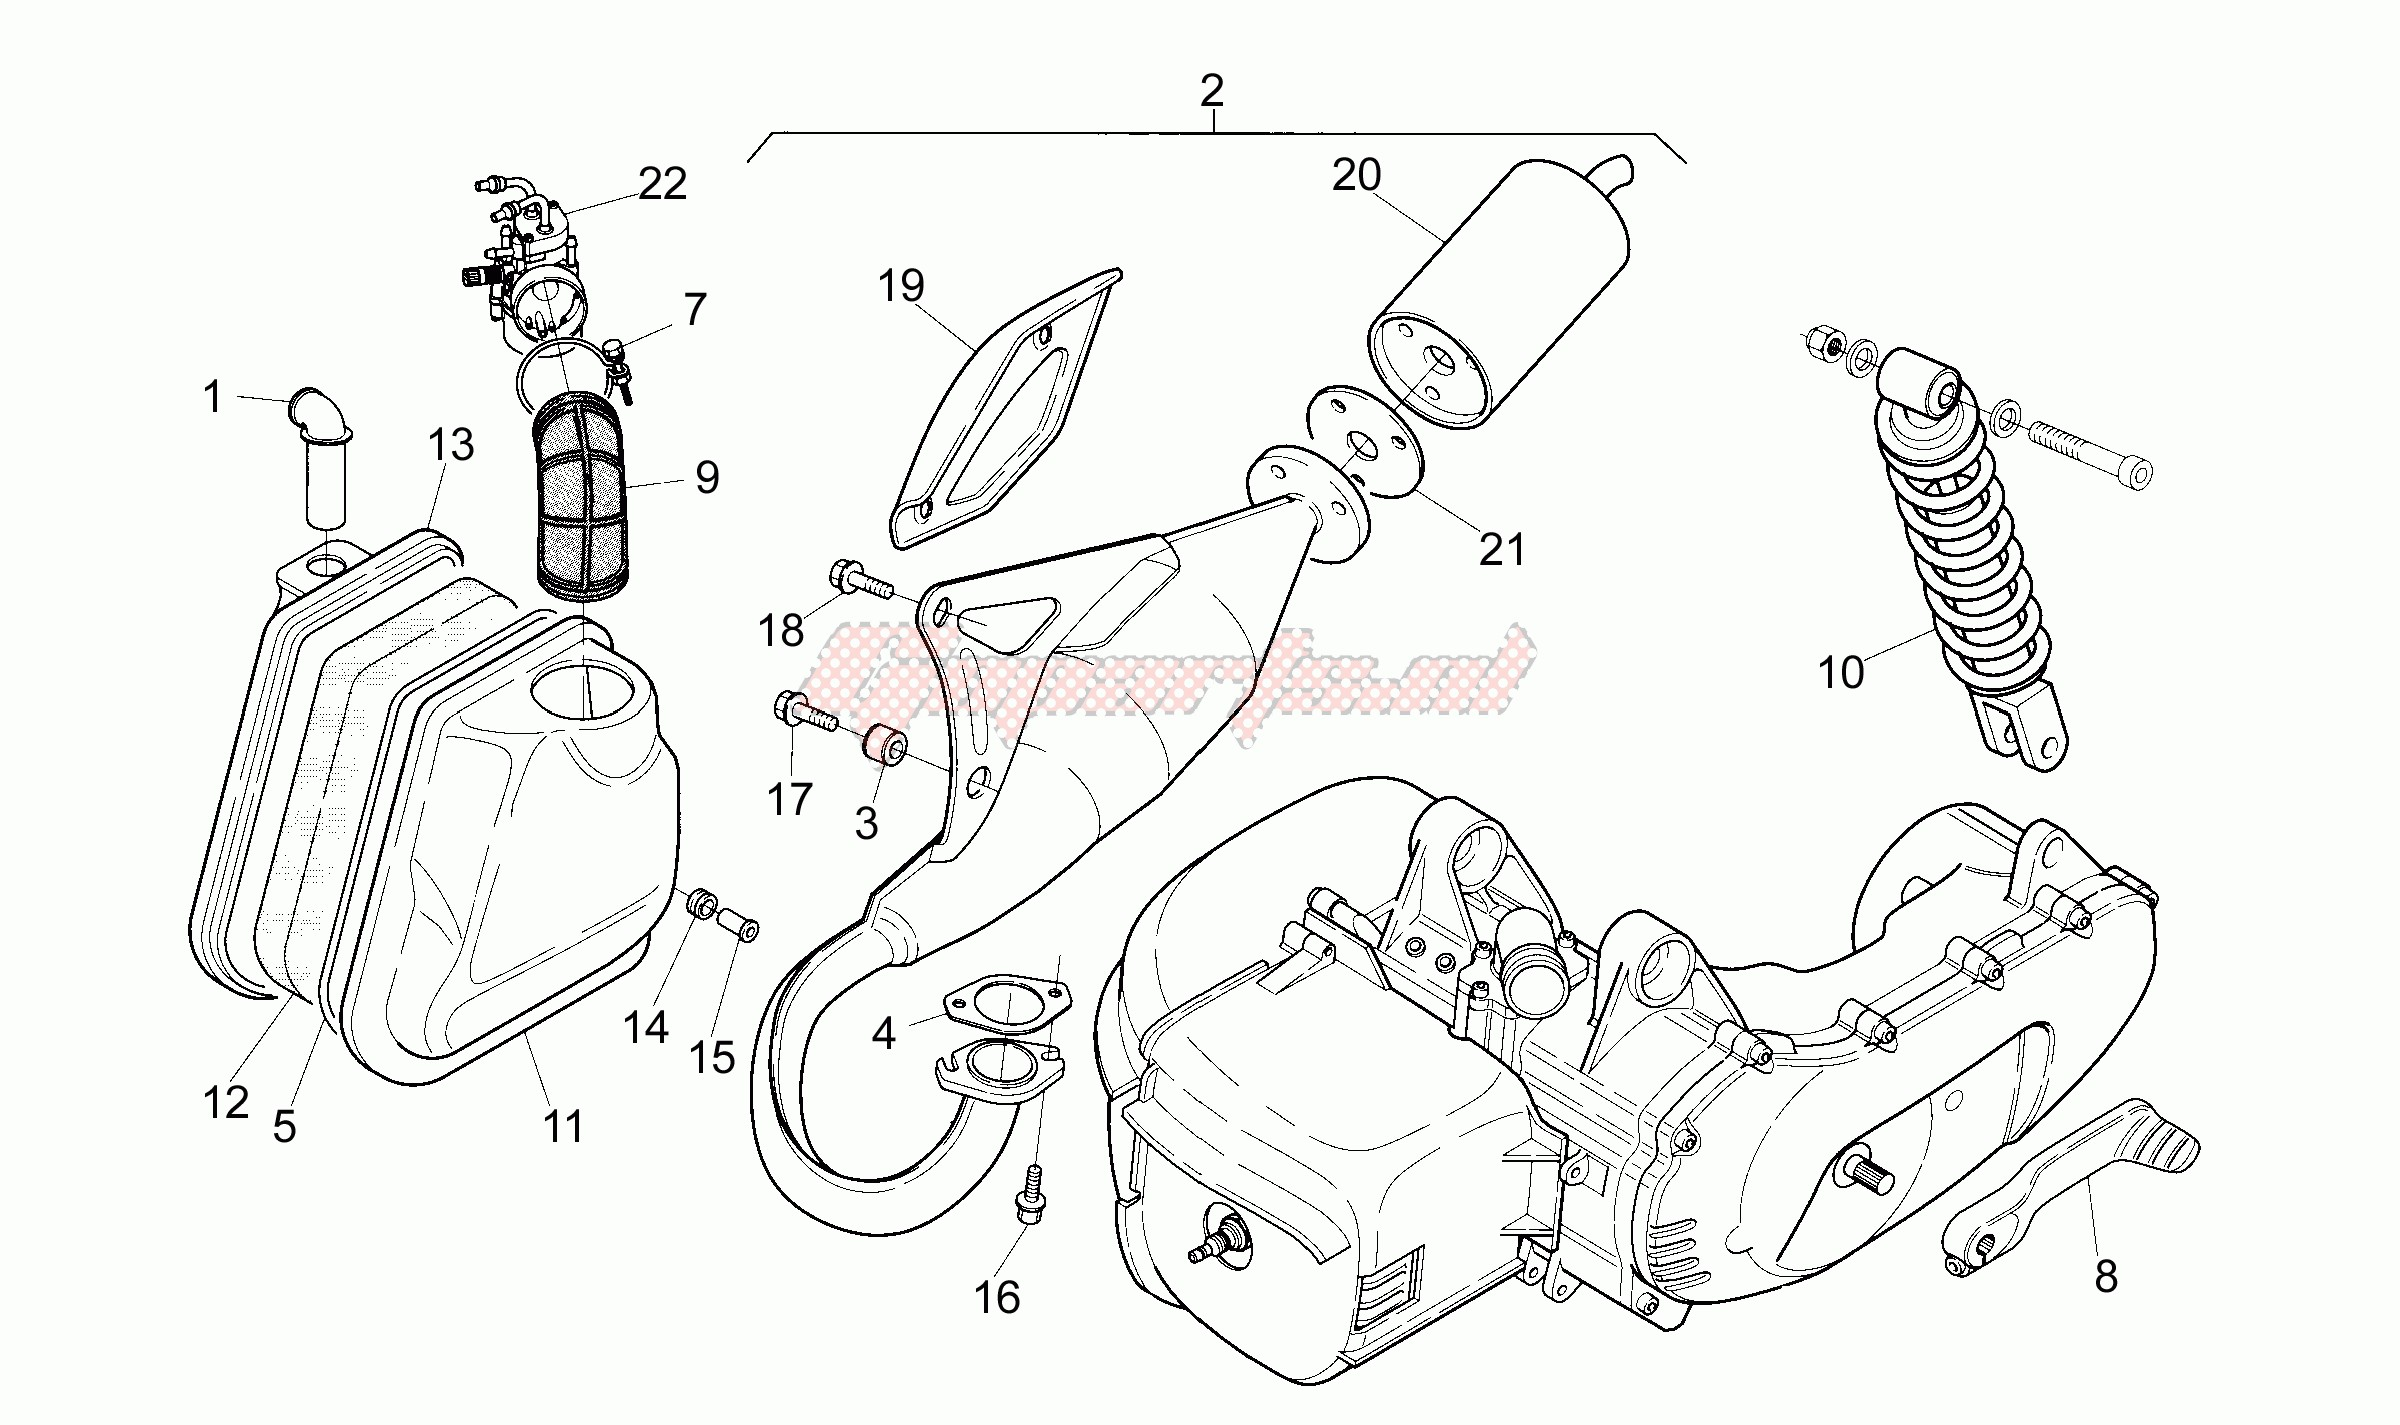 Exhaust unit image